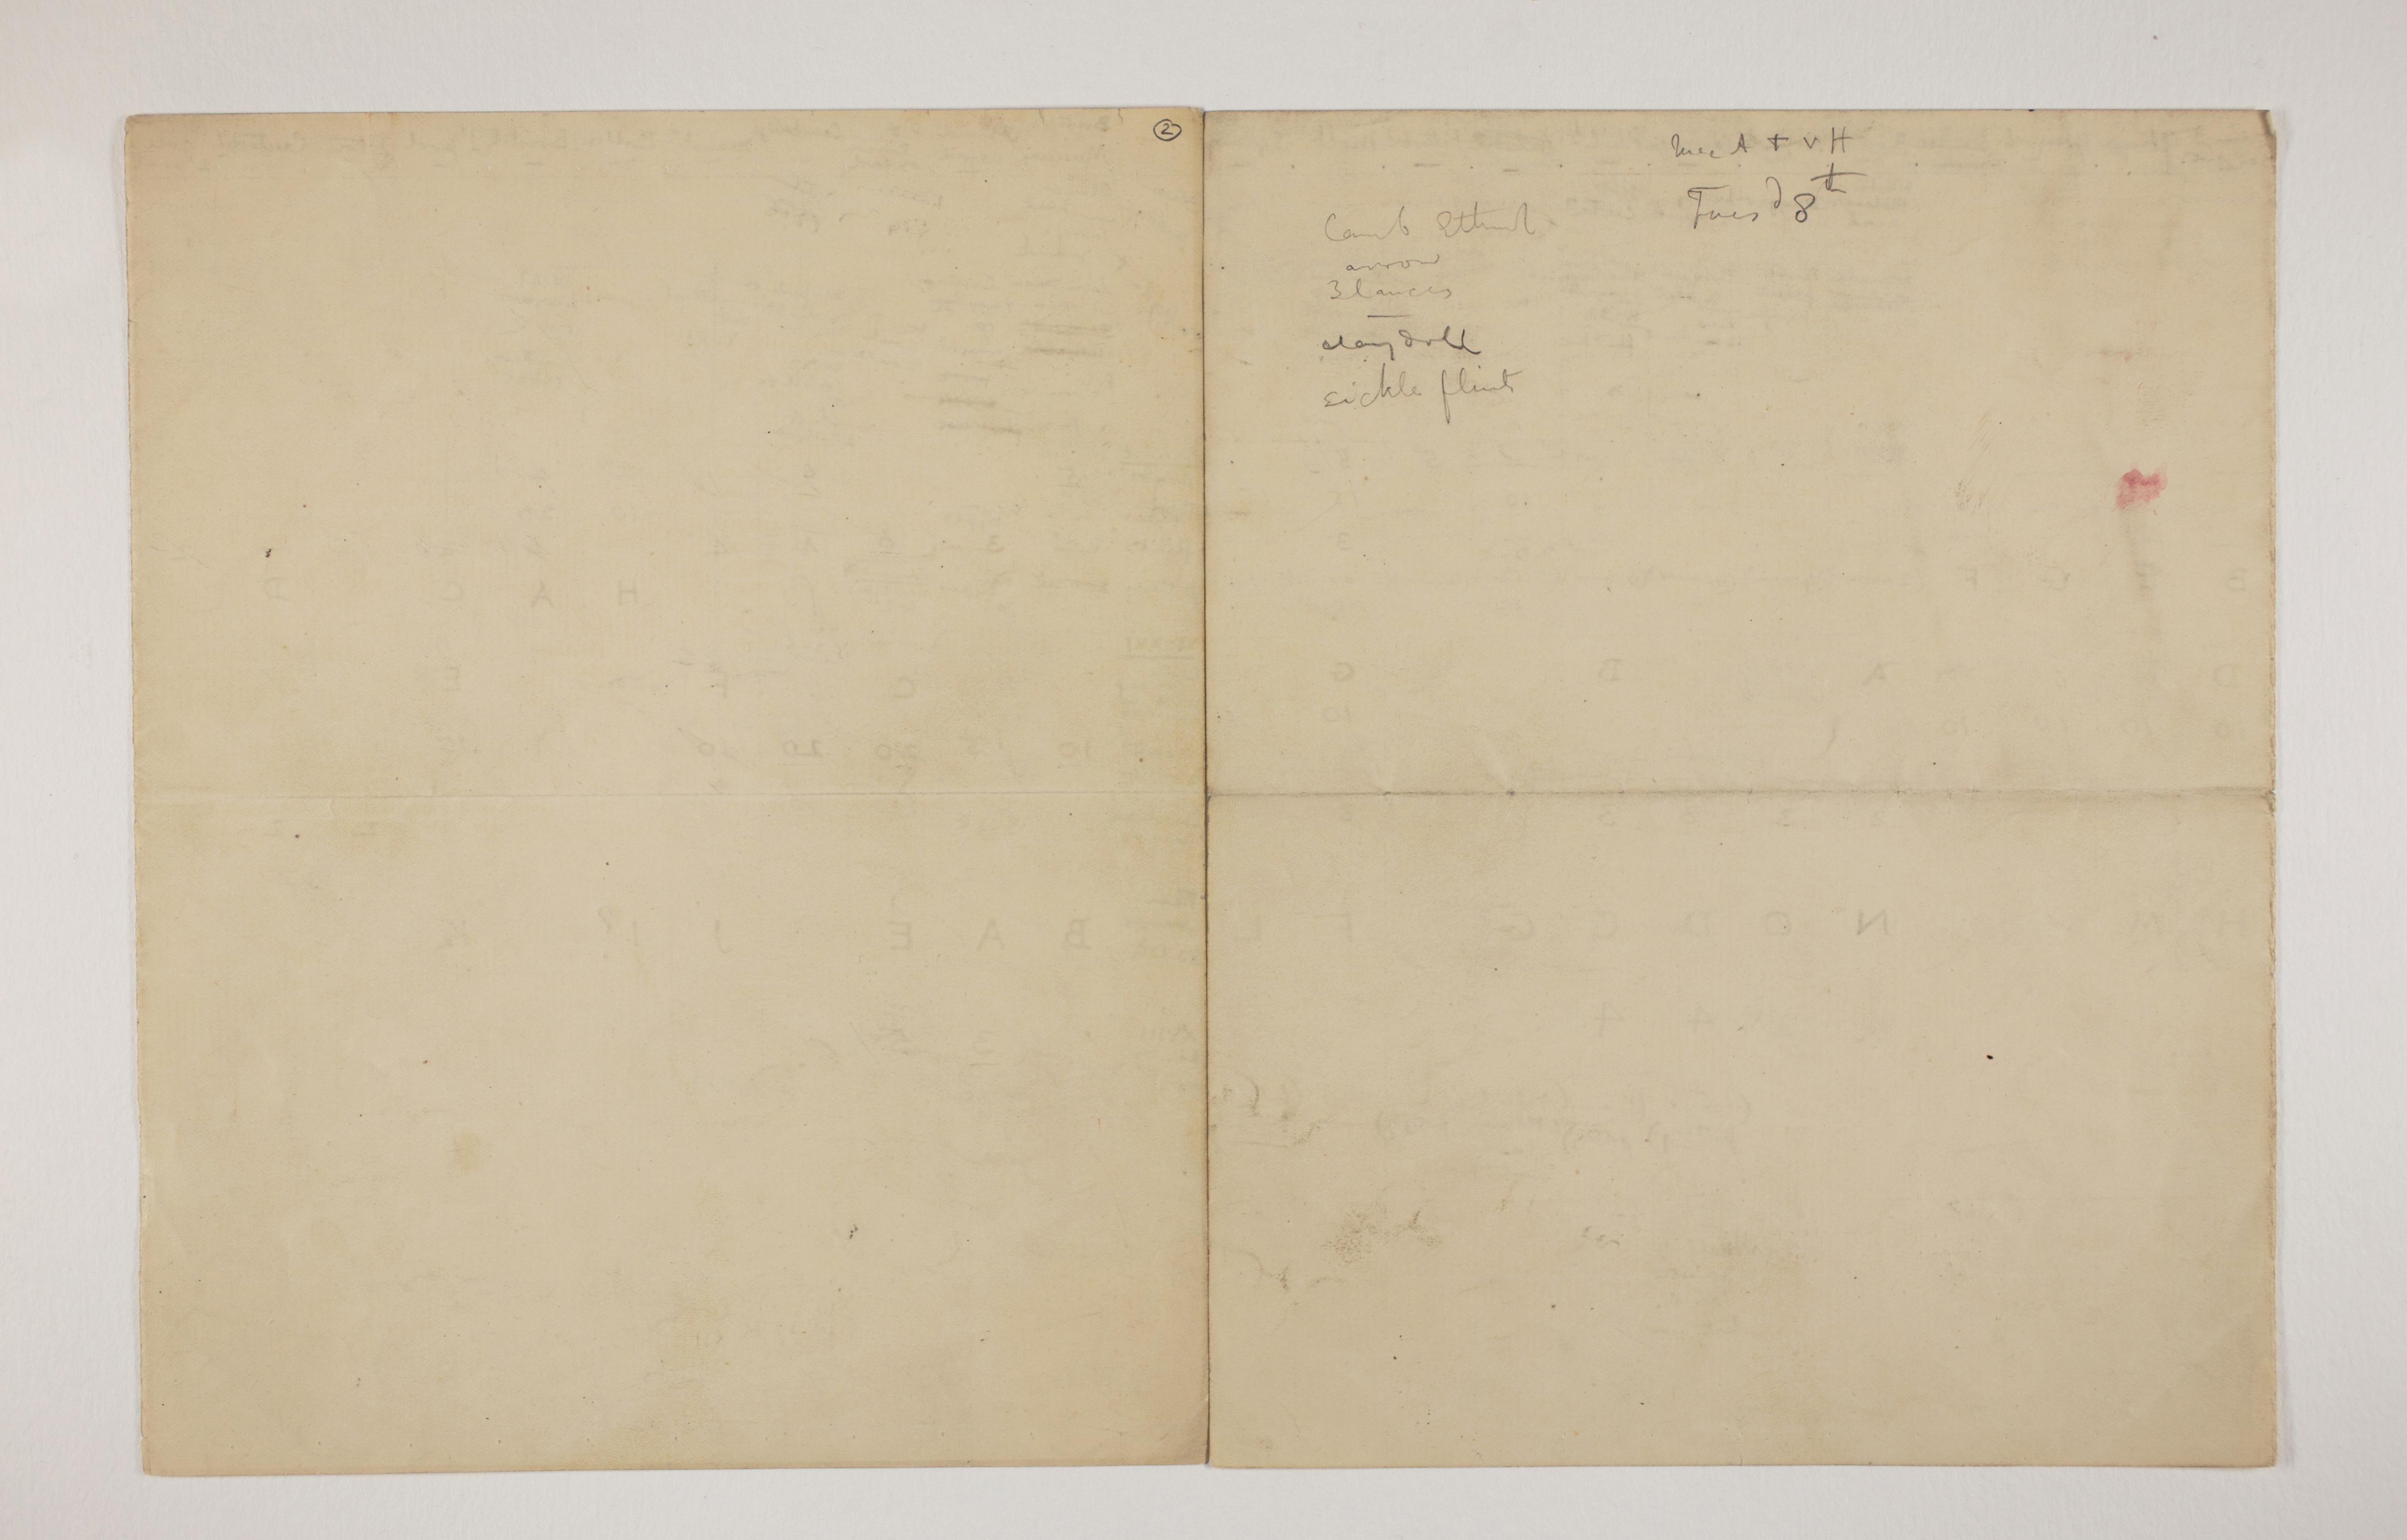 1898-99 Hu, Faiyum, Deir el-Bahri Multiple institution list PMA/WFP1/D/7/2.2